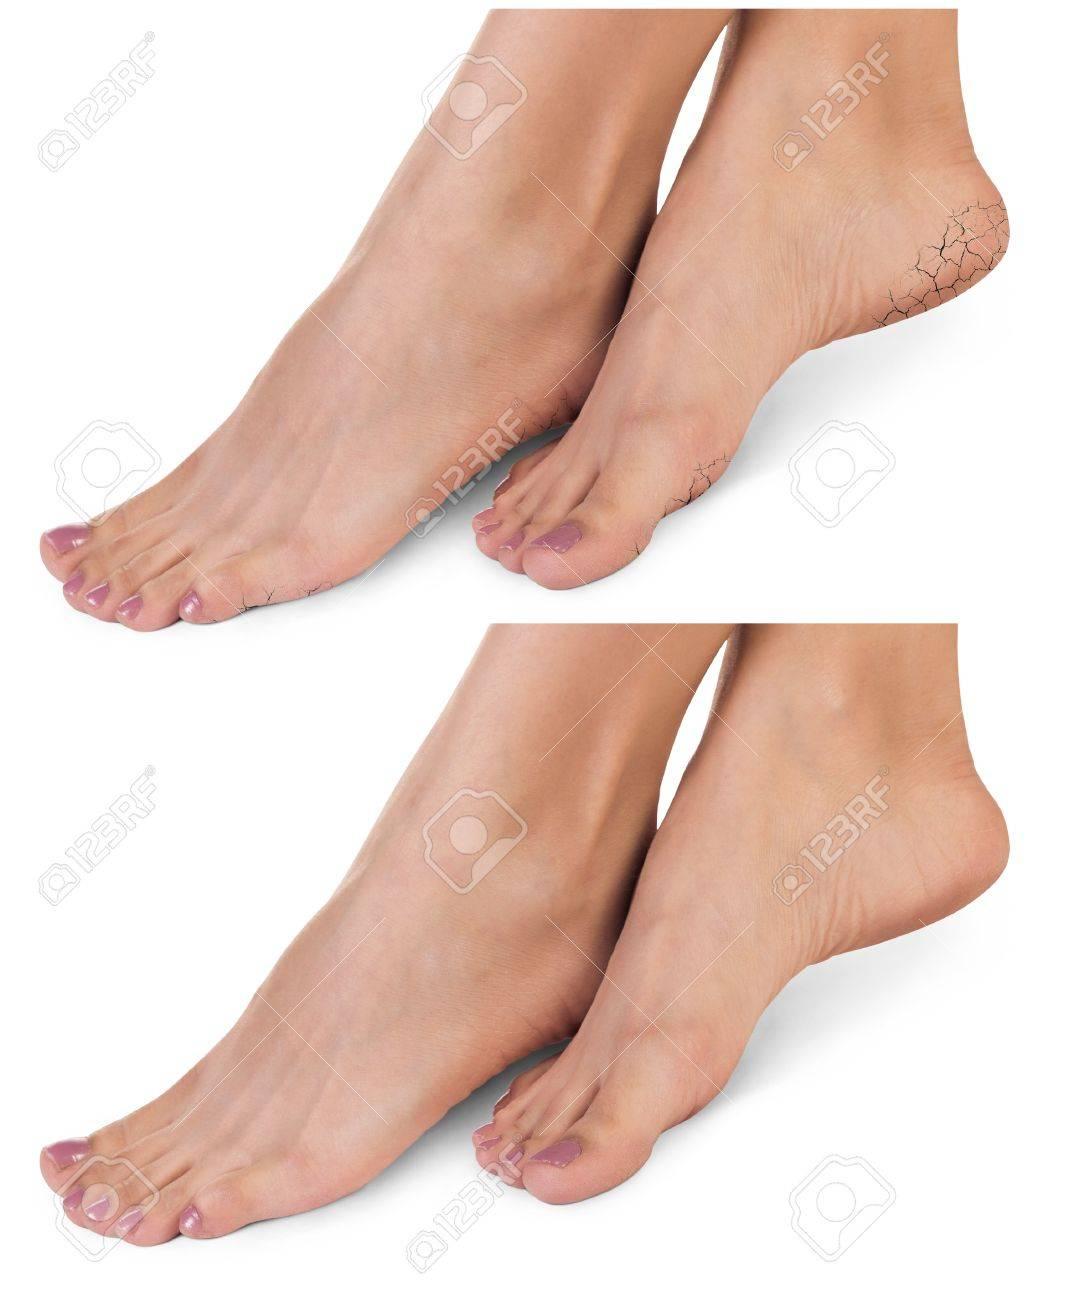 http://n3.datasn.io/data/api/v1/n3zm/image_of_skin_disease_5/by_table/skin_disease_image_download_access/eb/c3/61/bd/ebc361bdc2c9607efb2bad41f30c068949dde9b2.jpg